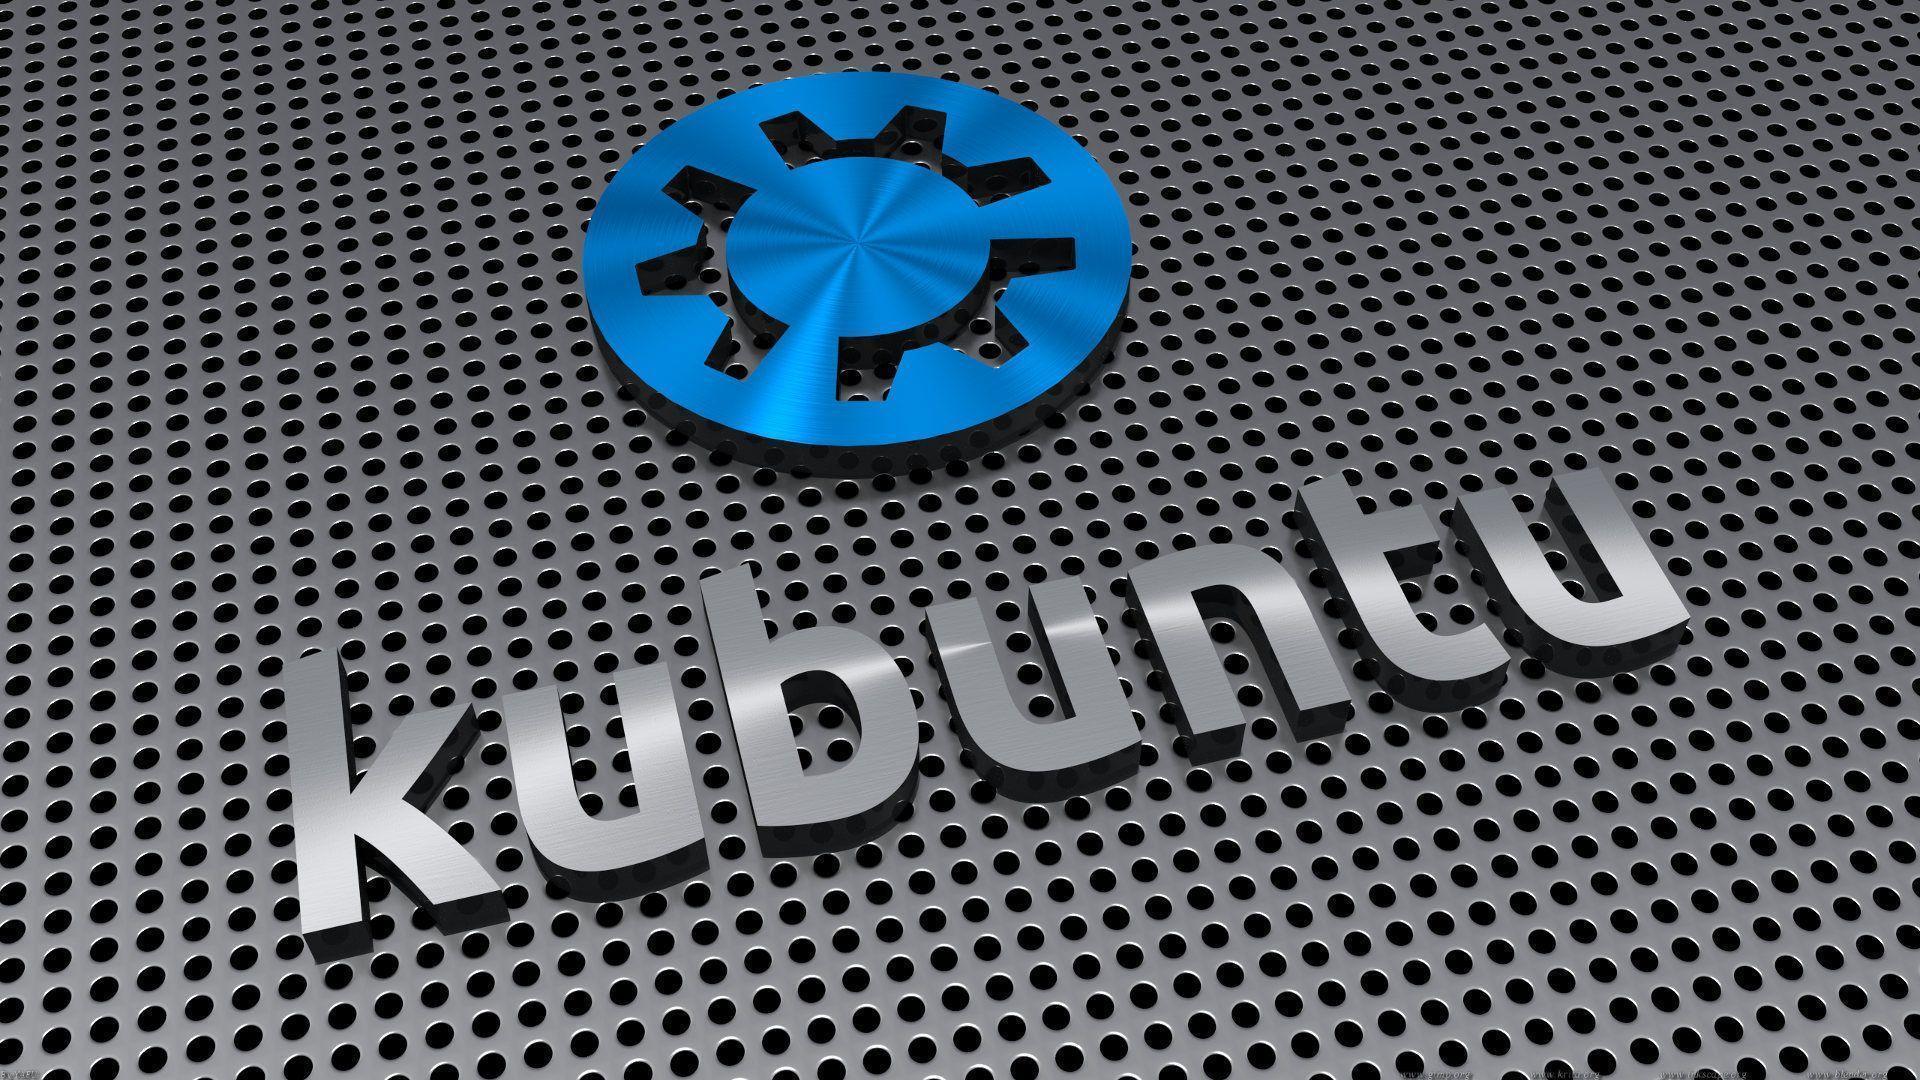 kubuntu wallpaper 1920x1080 - photo #22